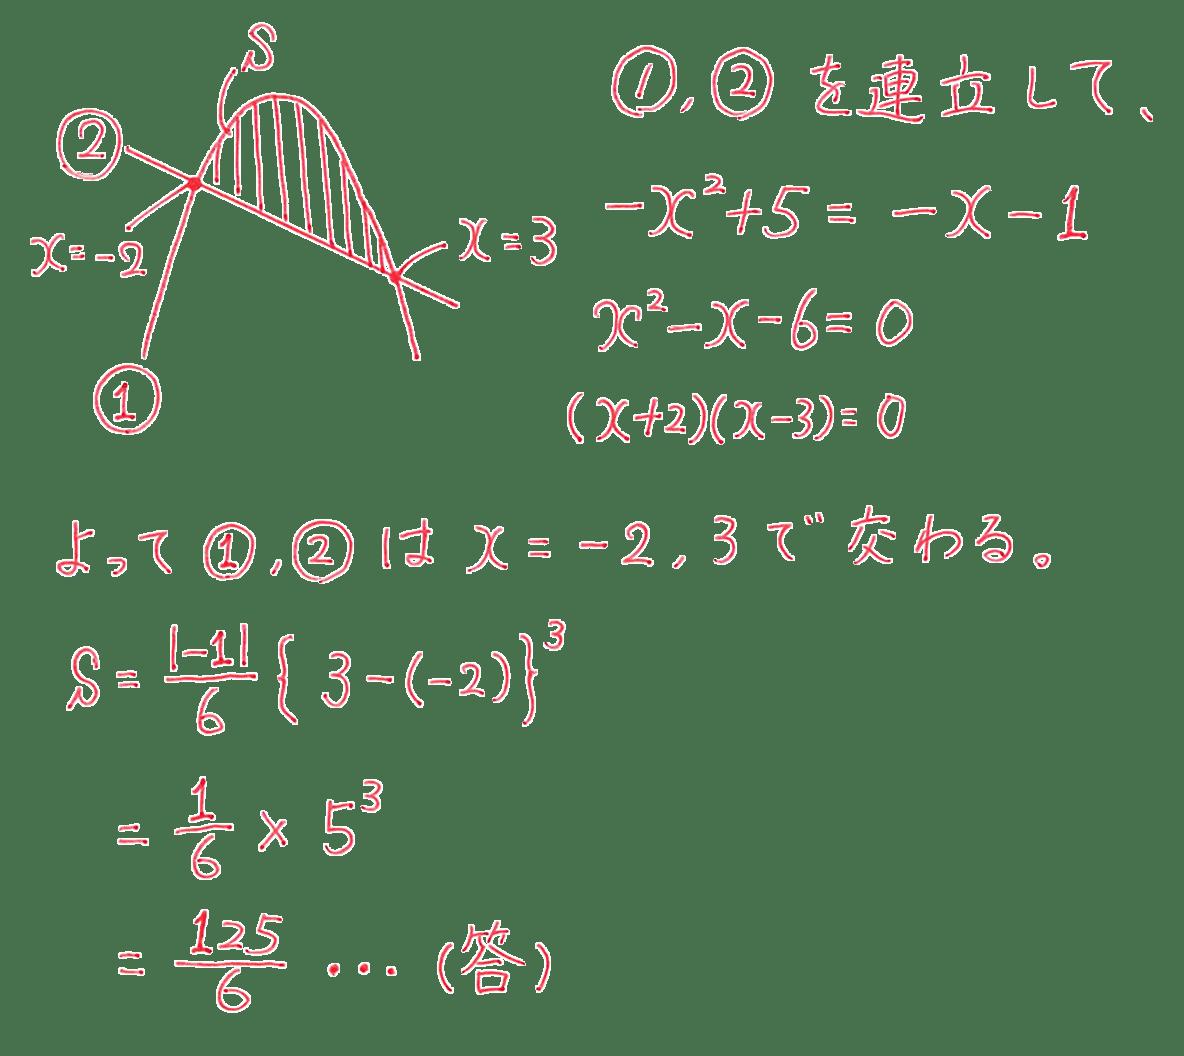 高校数学Ⅱ 微分法と積分法27 練習 答え